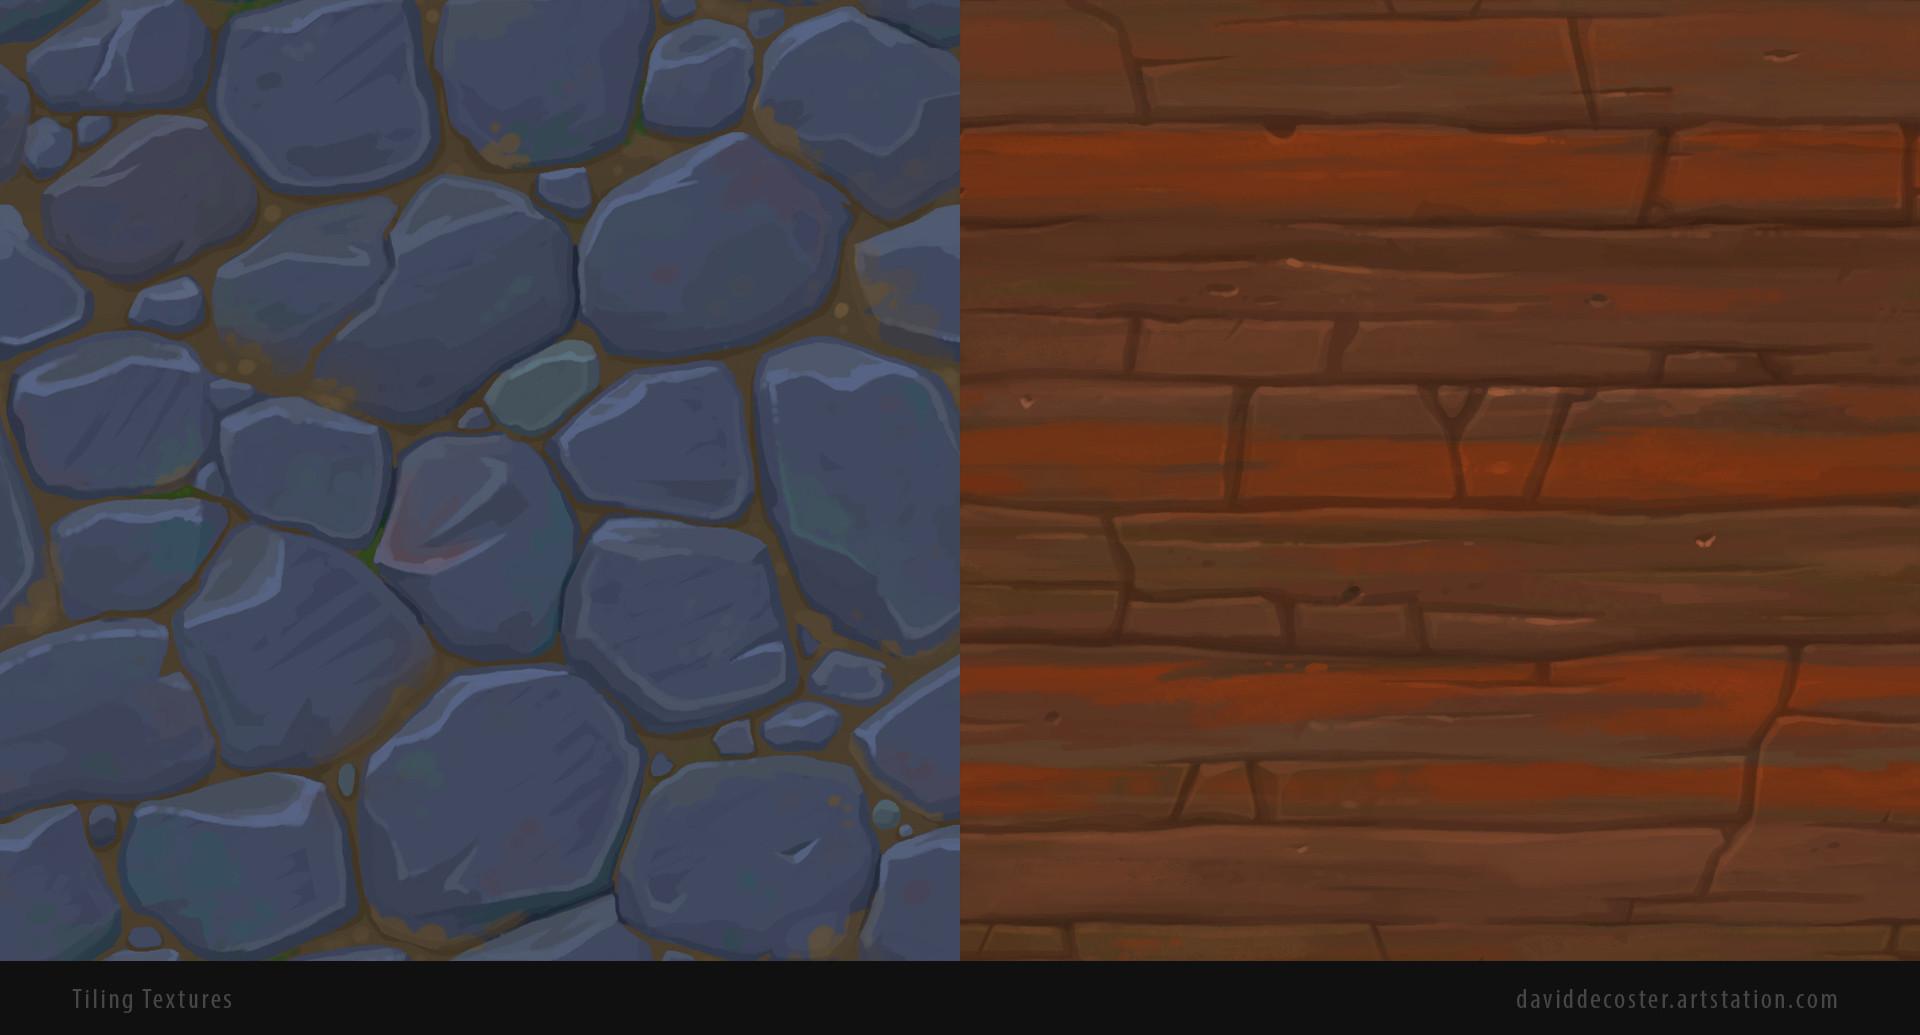 David decoster decoster tiling textures 04